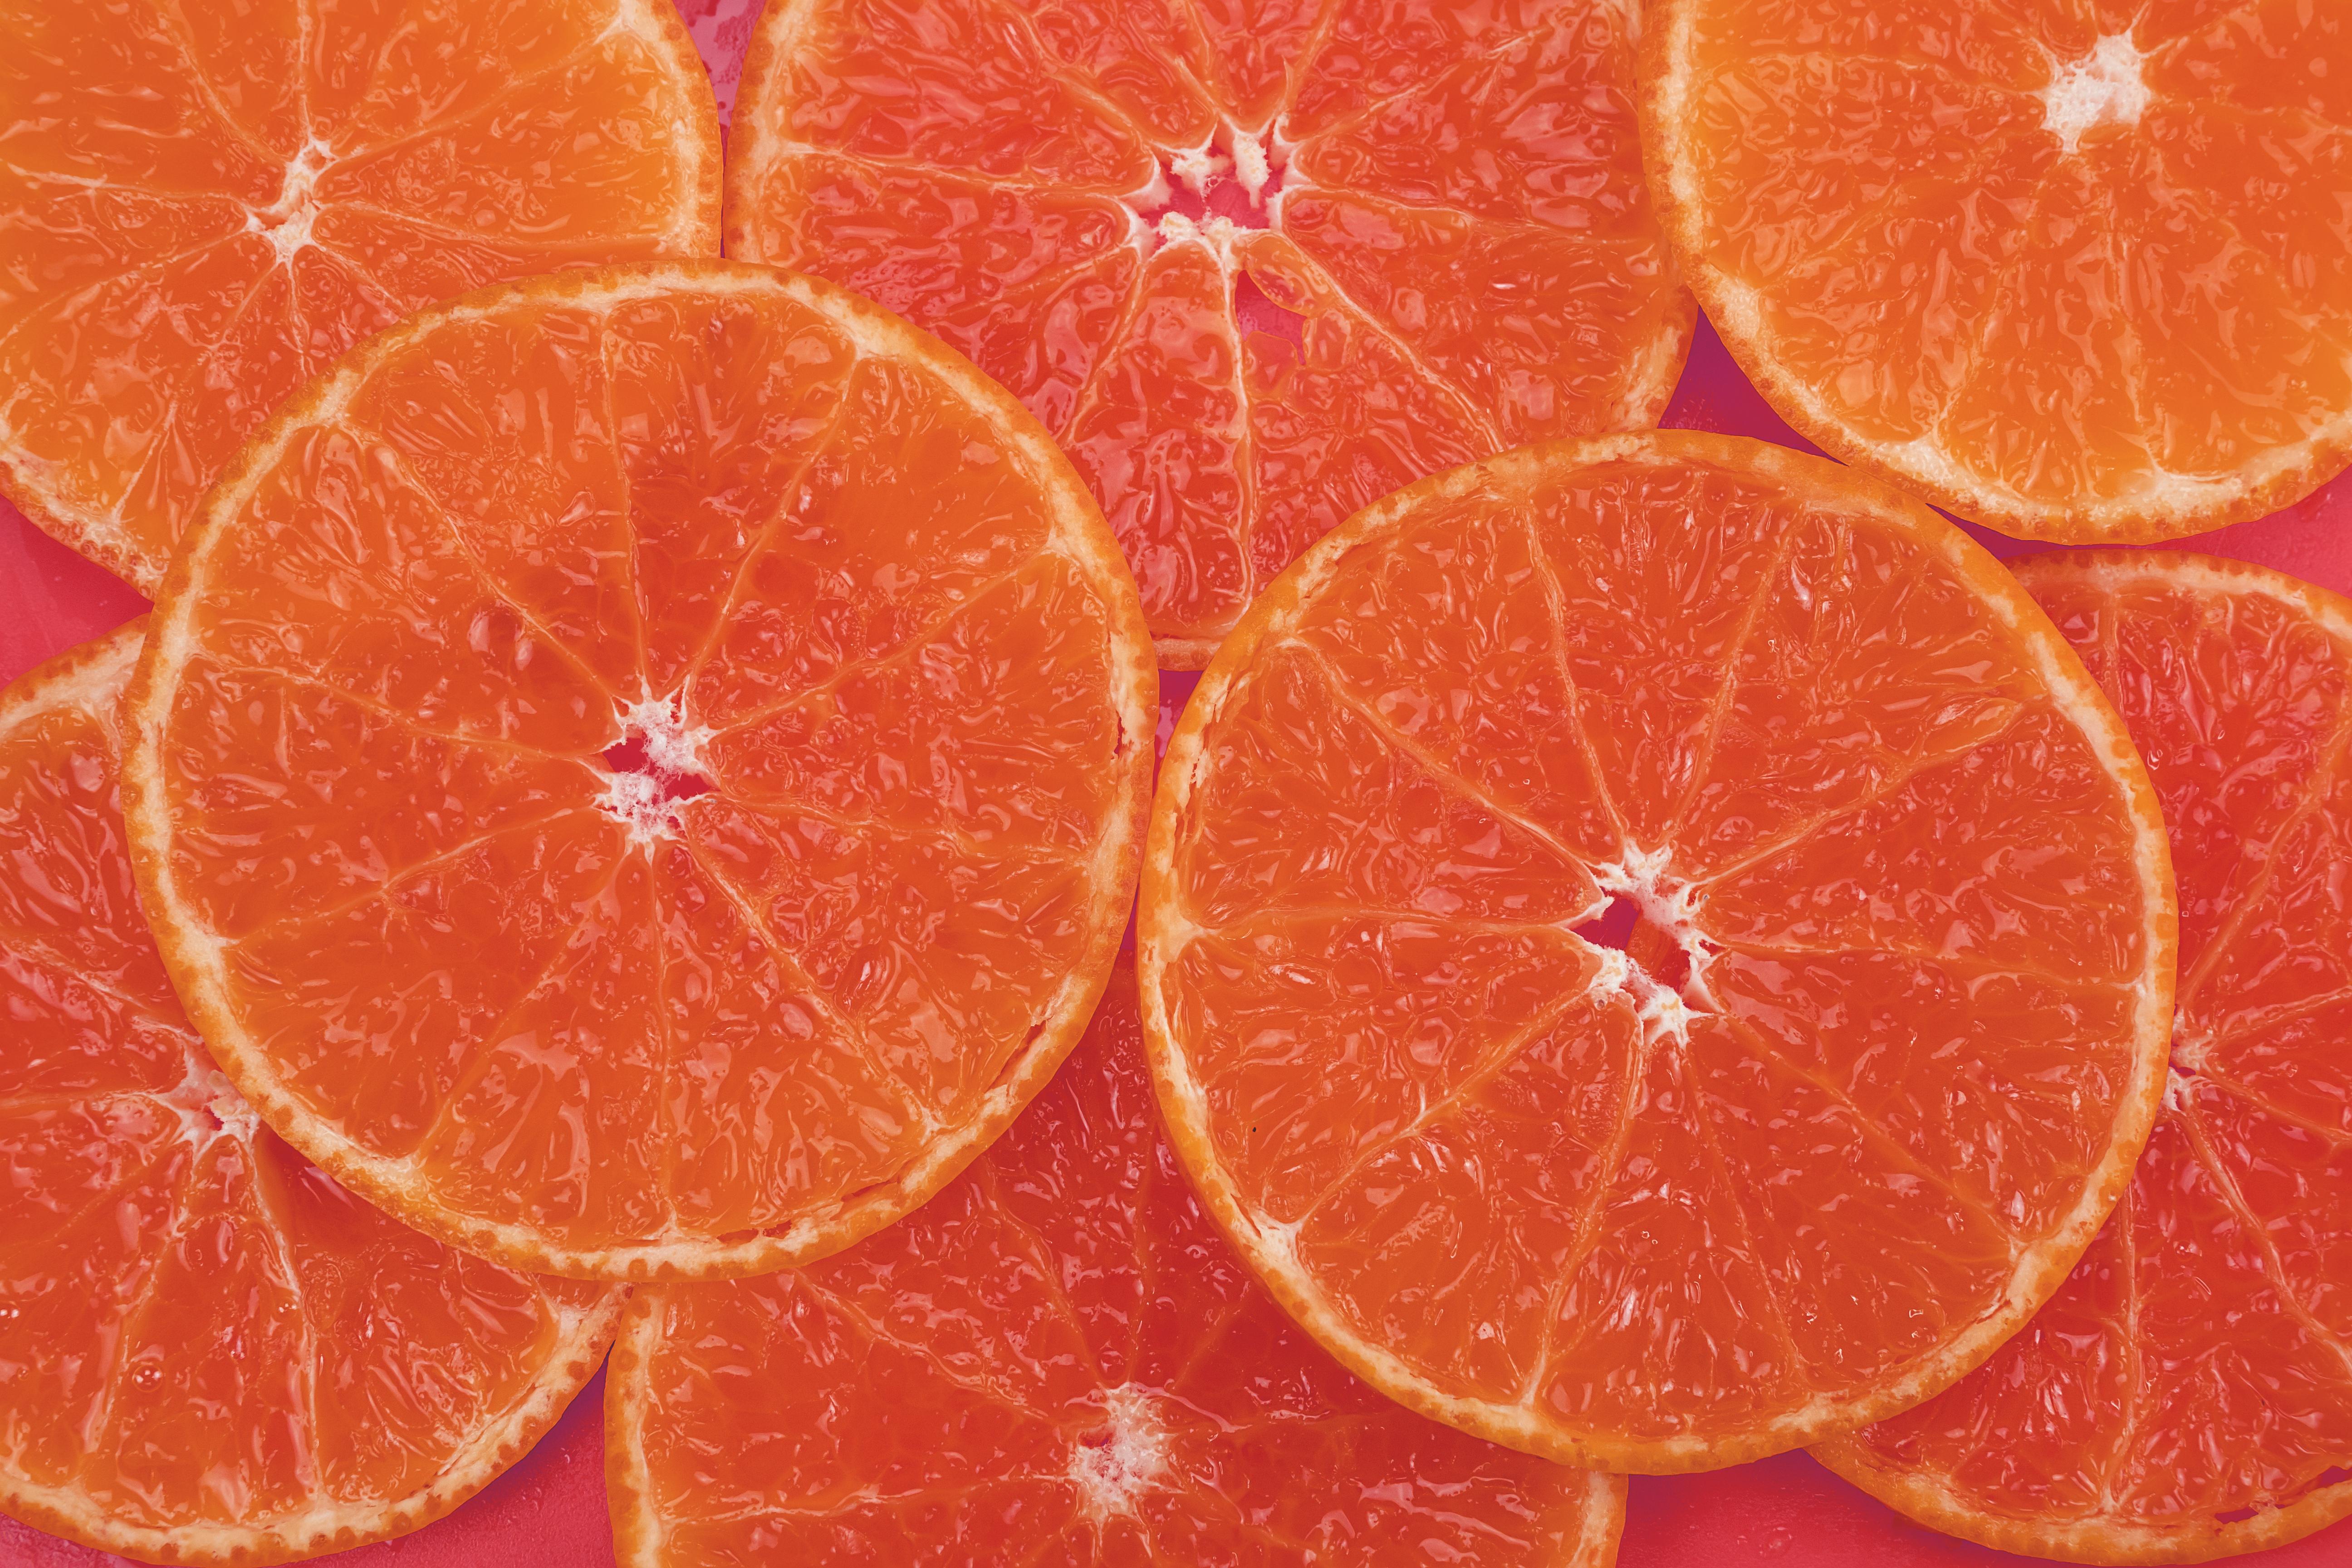 fresh-sliced-juicy-orange-fruit-set-over